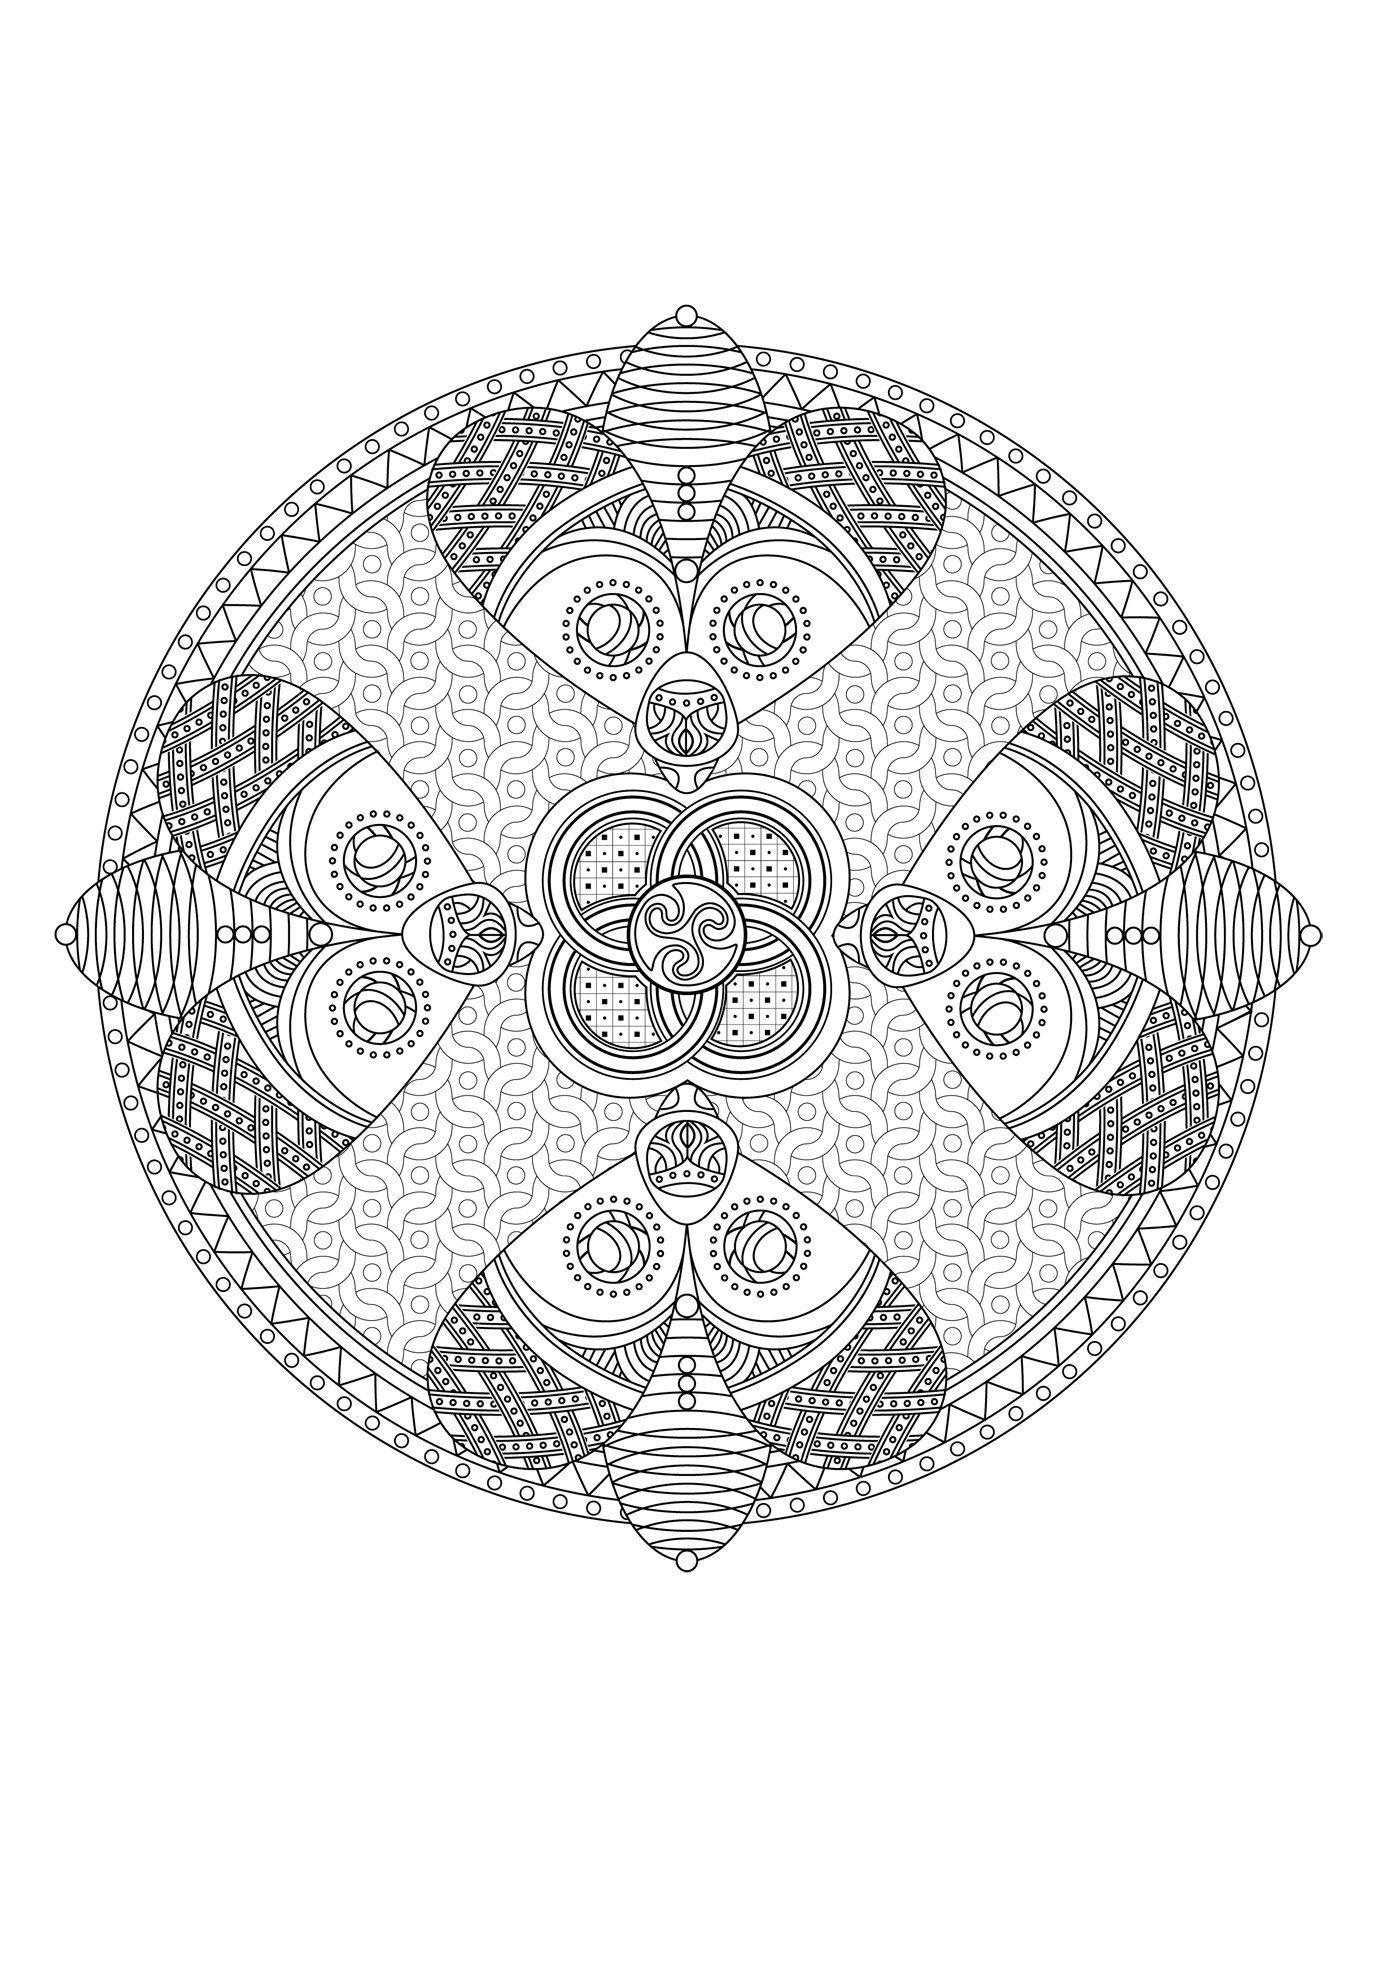 Art Therapie Celtique 100 Coloriages Anti Stress Amazon De Michel Solliec Gael Hily Fremdsprachige Bucher Muster Malvorlagen Mandalas Bucher